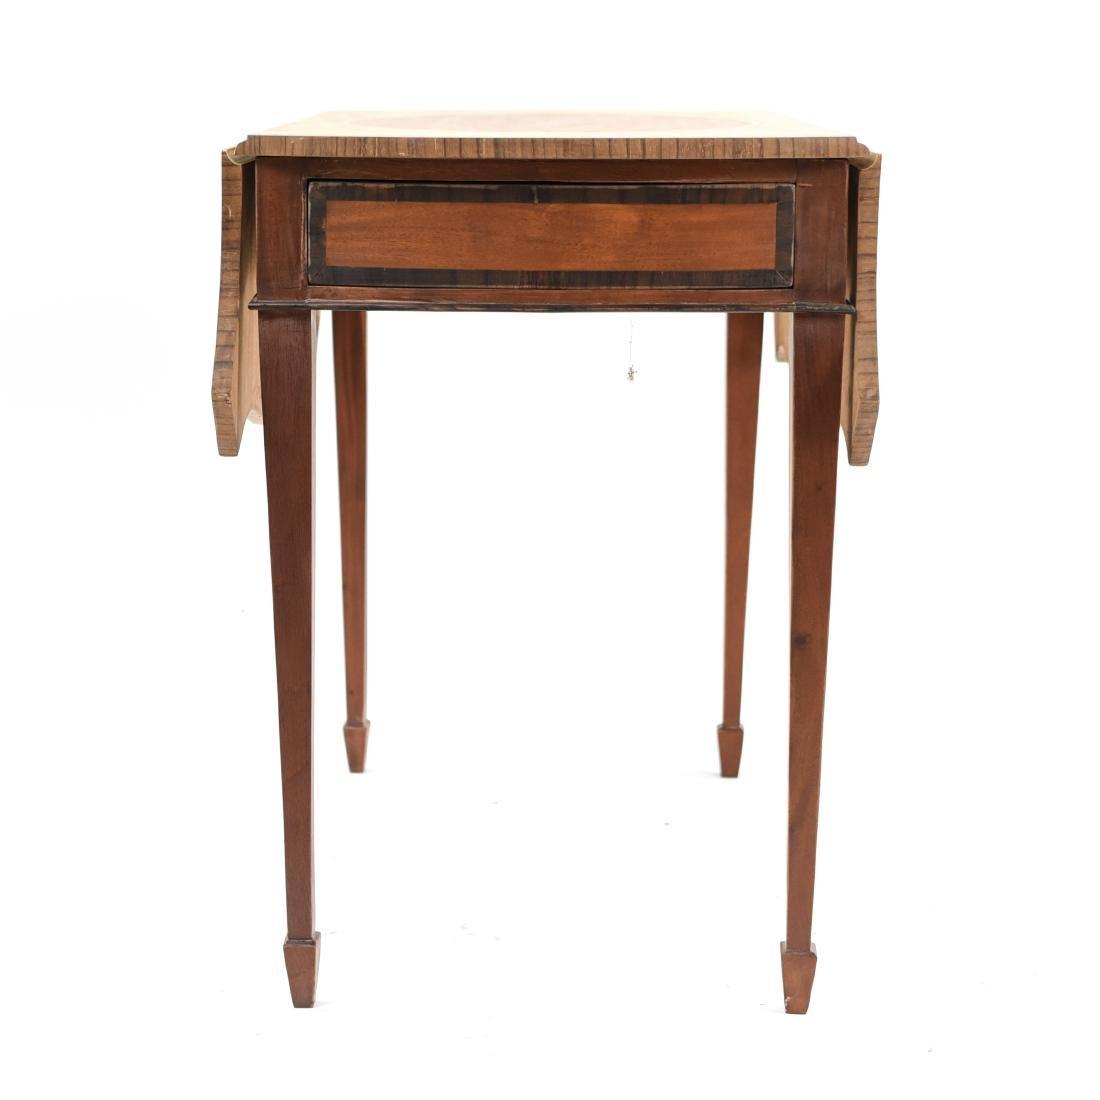 PEMBROKE TABLE - 2